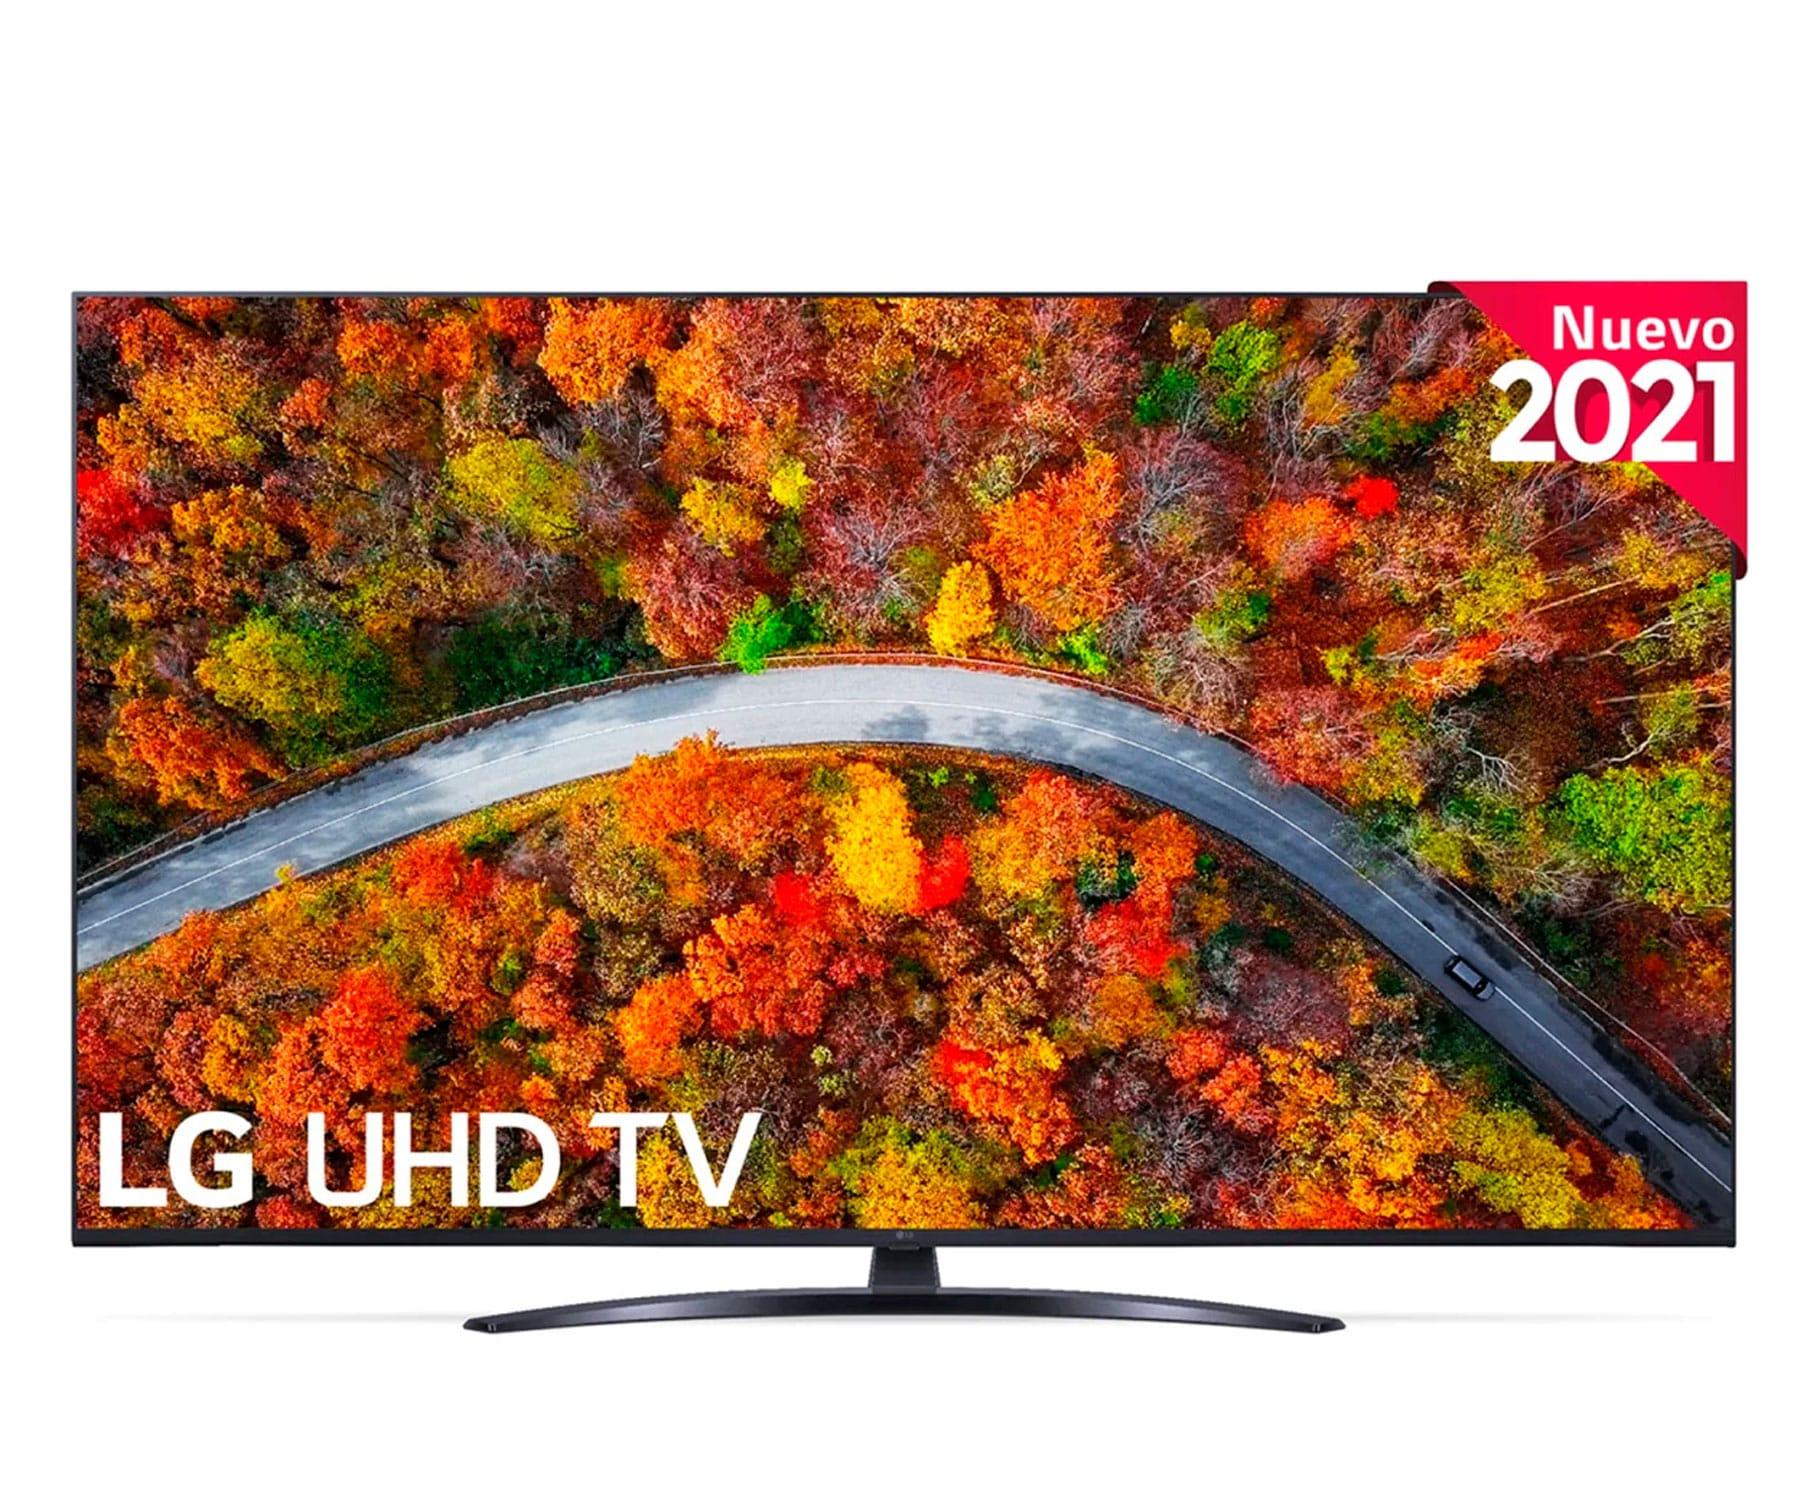 LG 55UP81006LA TELEVISOR 55'' LED UHD 4K SMART TV WEBOS 6.0 WIFI HDMI BLUETOOTH